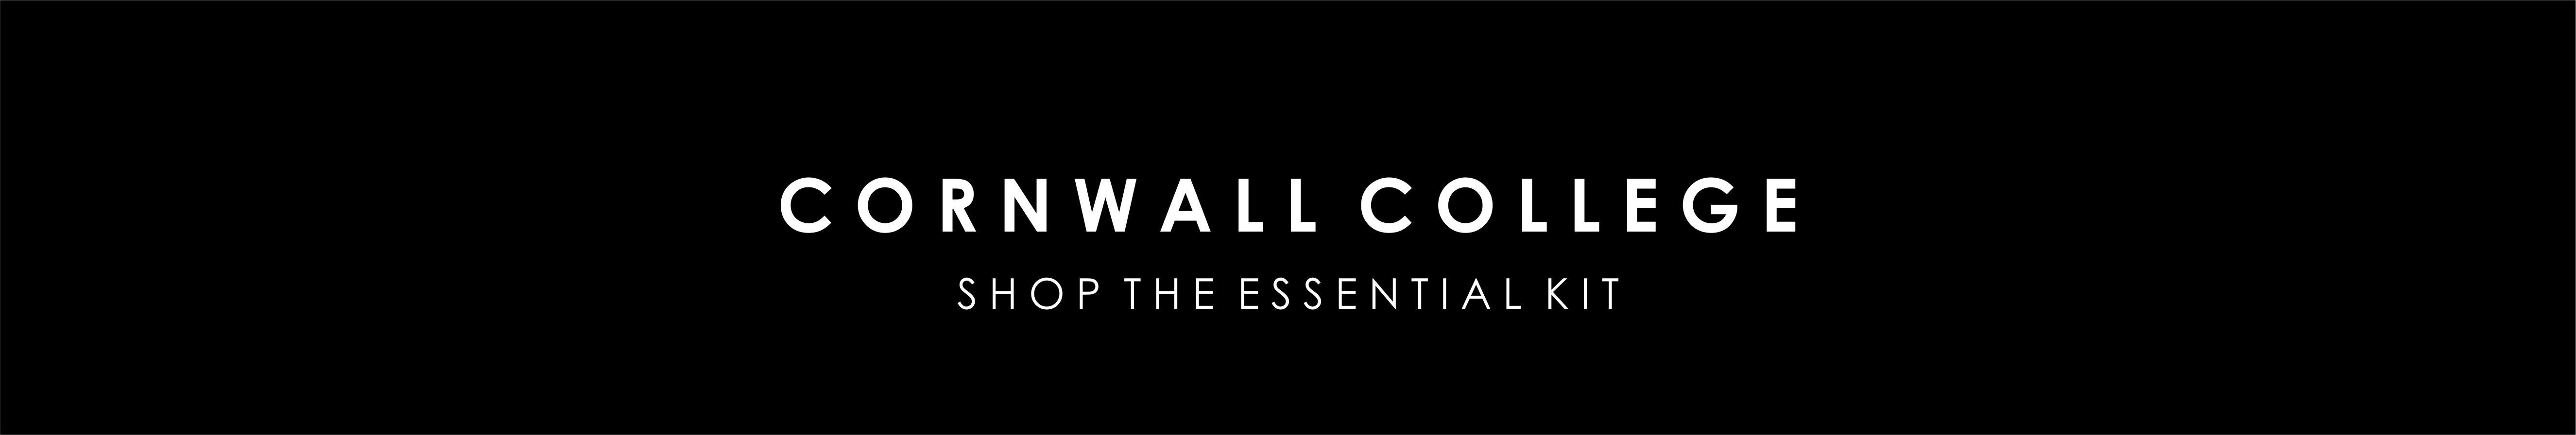 cornwall-college-banner-duchy.jpg